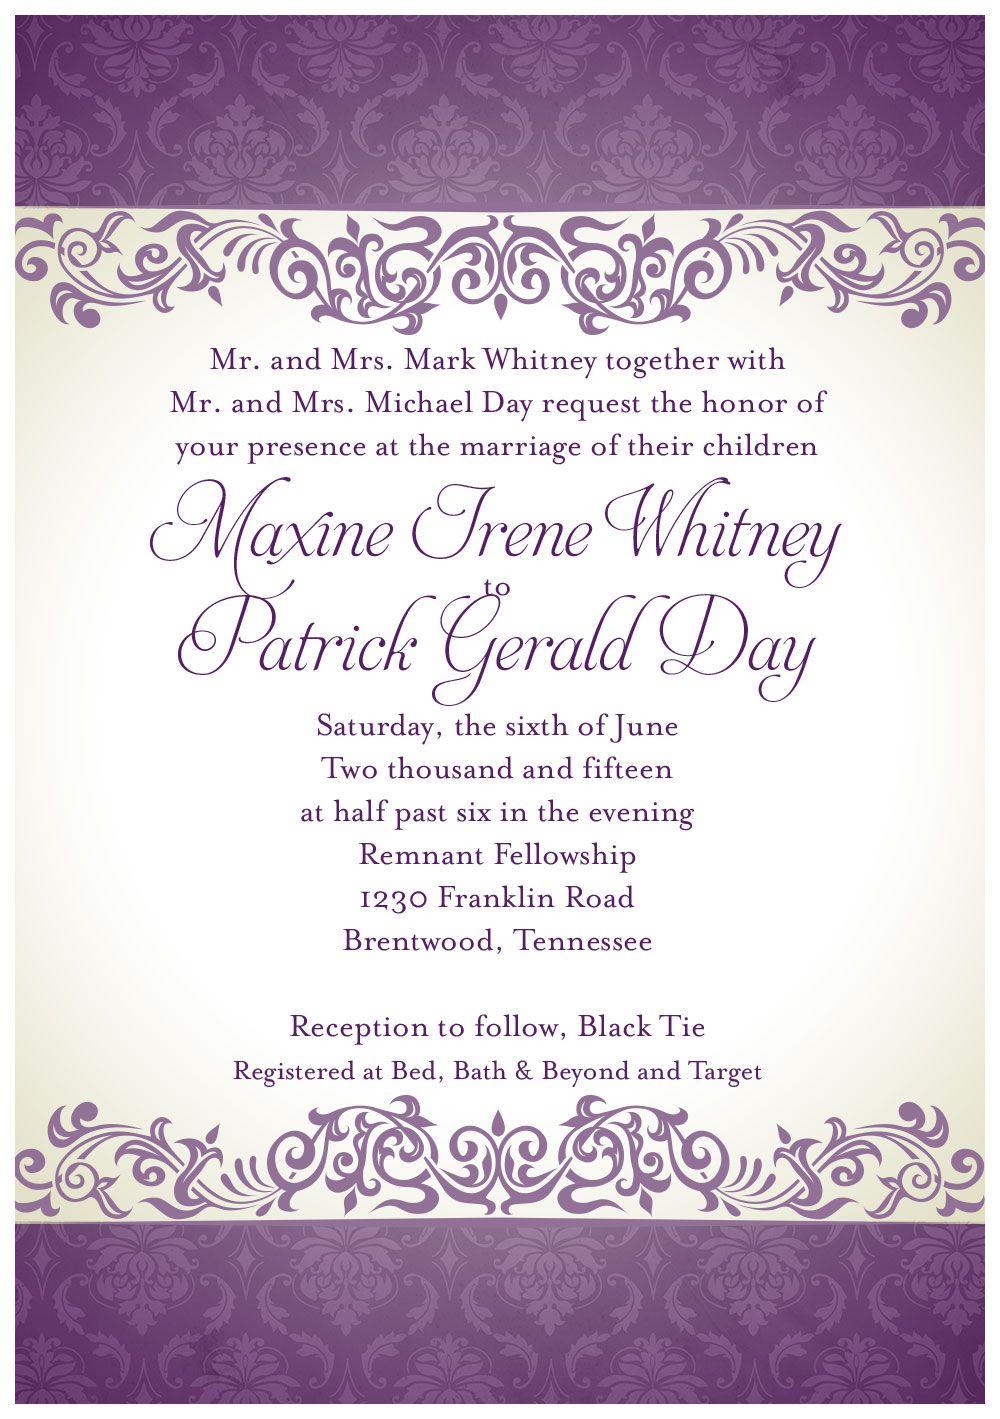 June summer wedding invitation purple damask design | Wedding ...